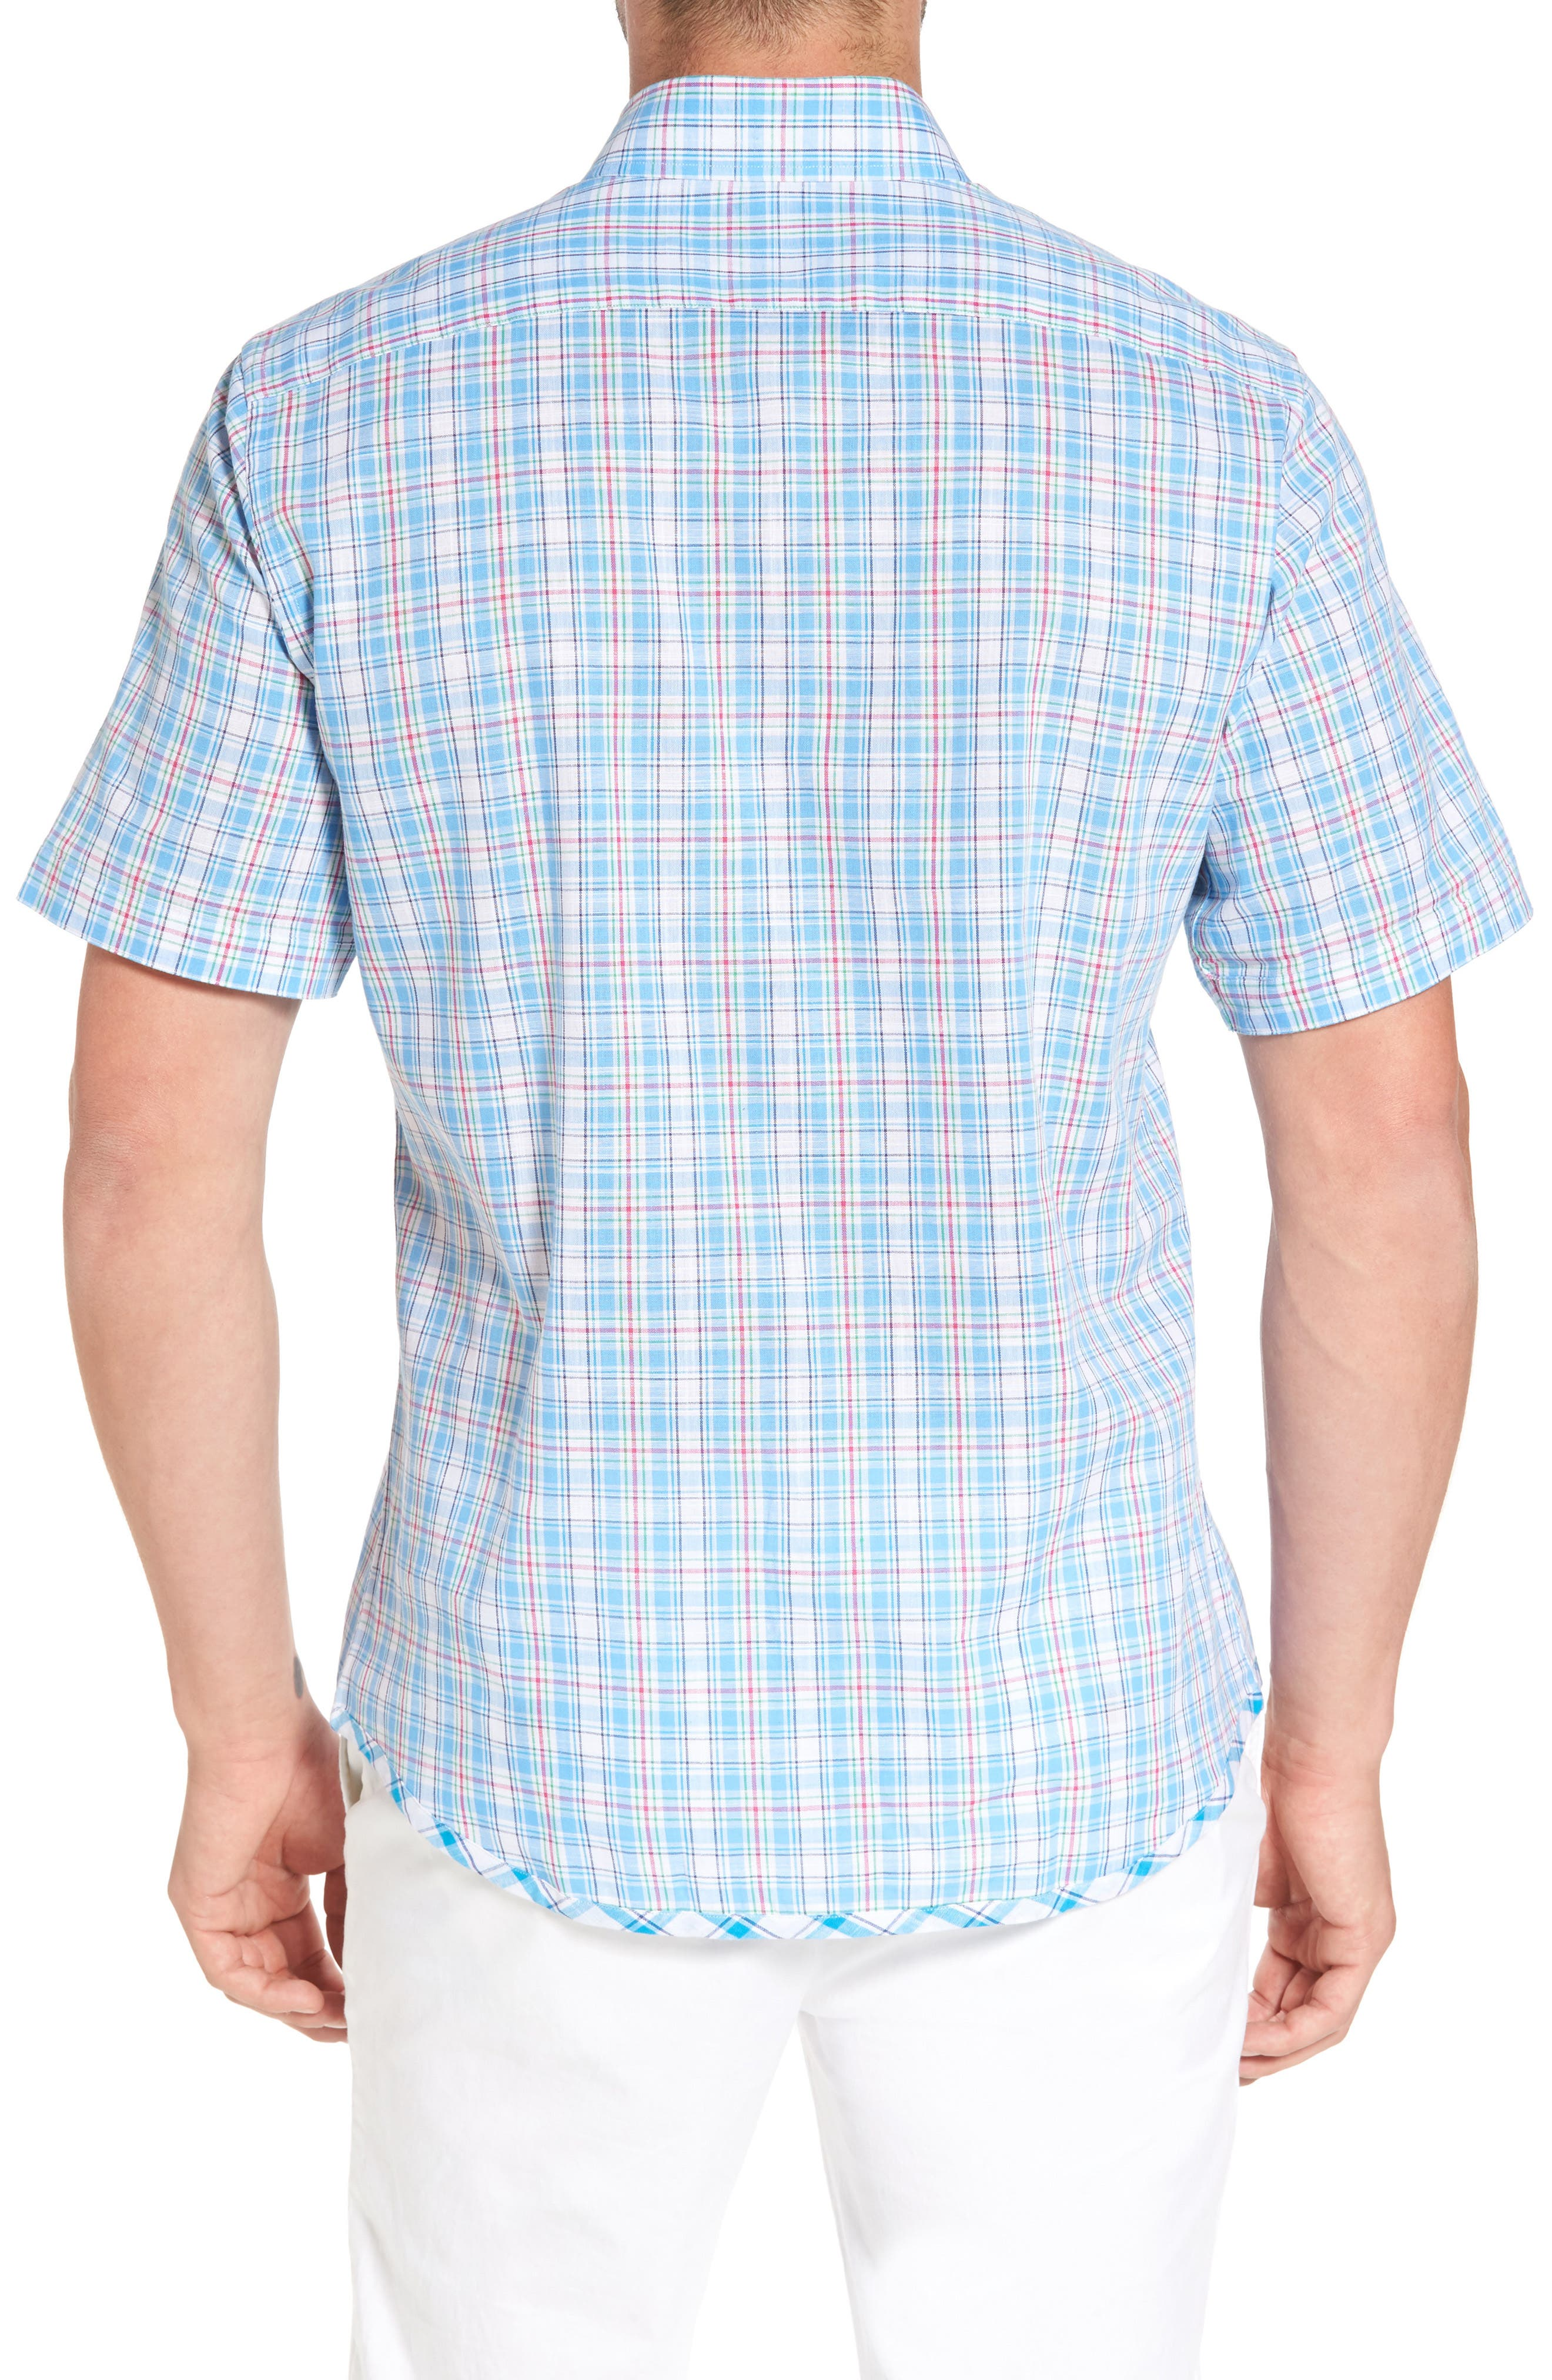 Nectarine Sport Shirt,                             Alternate thumbnail 2, color,